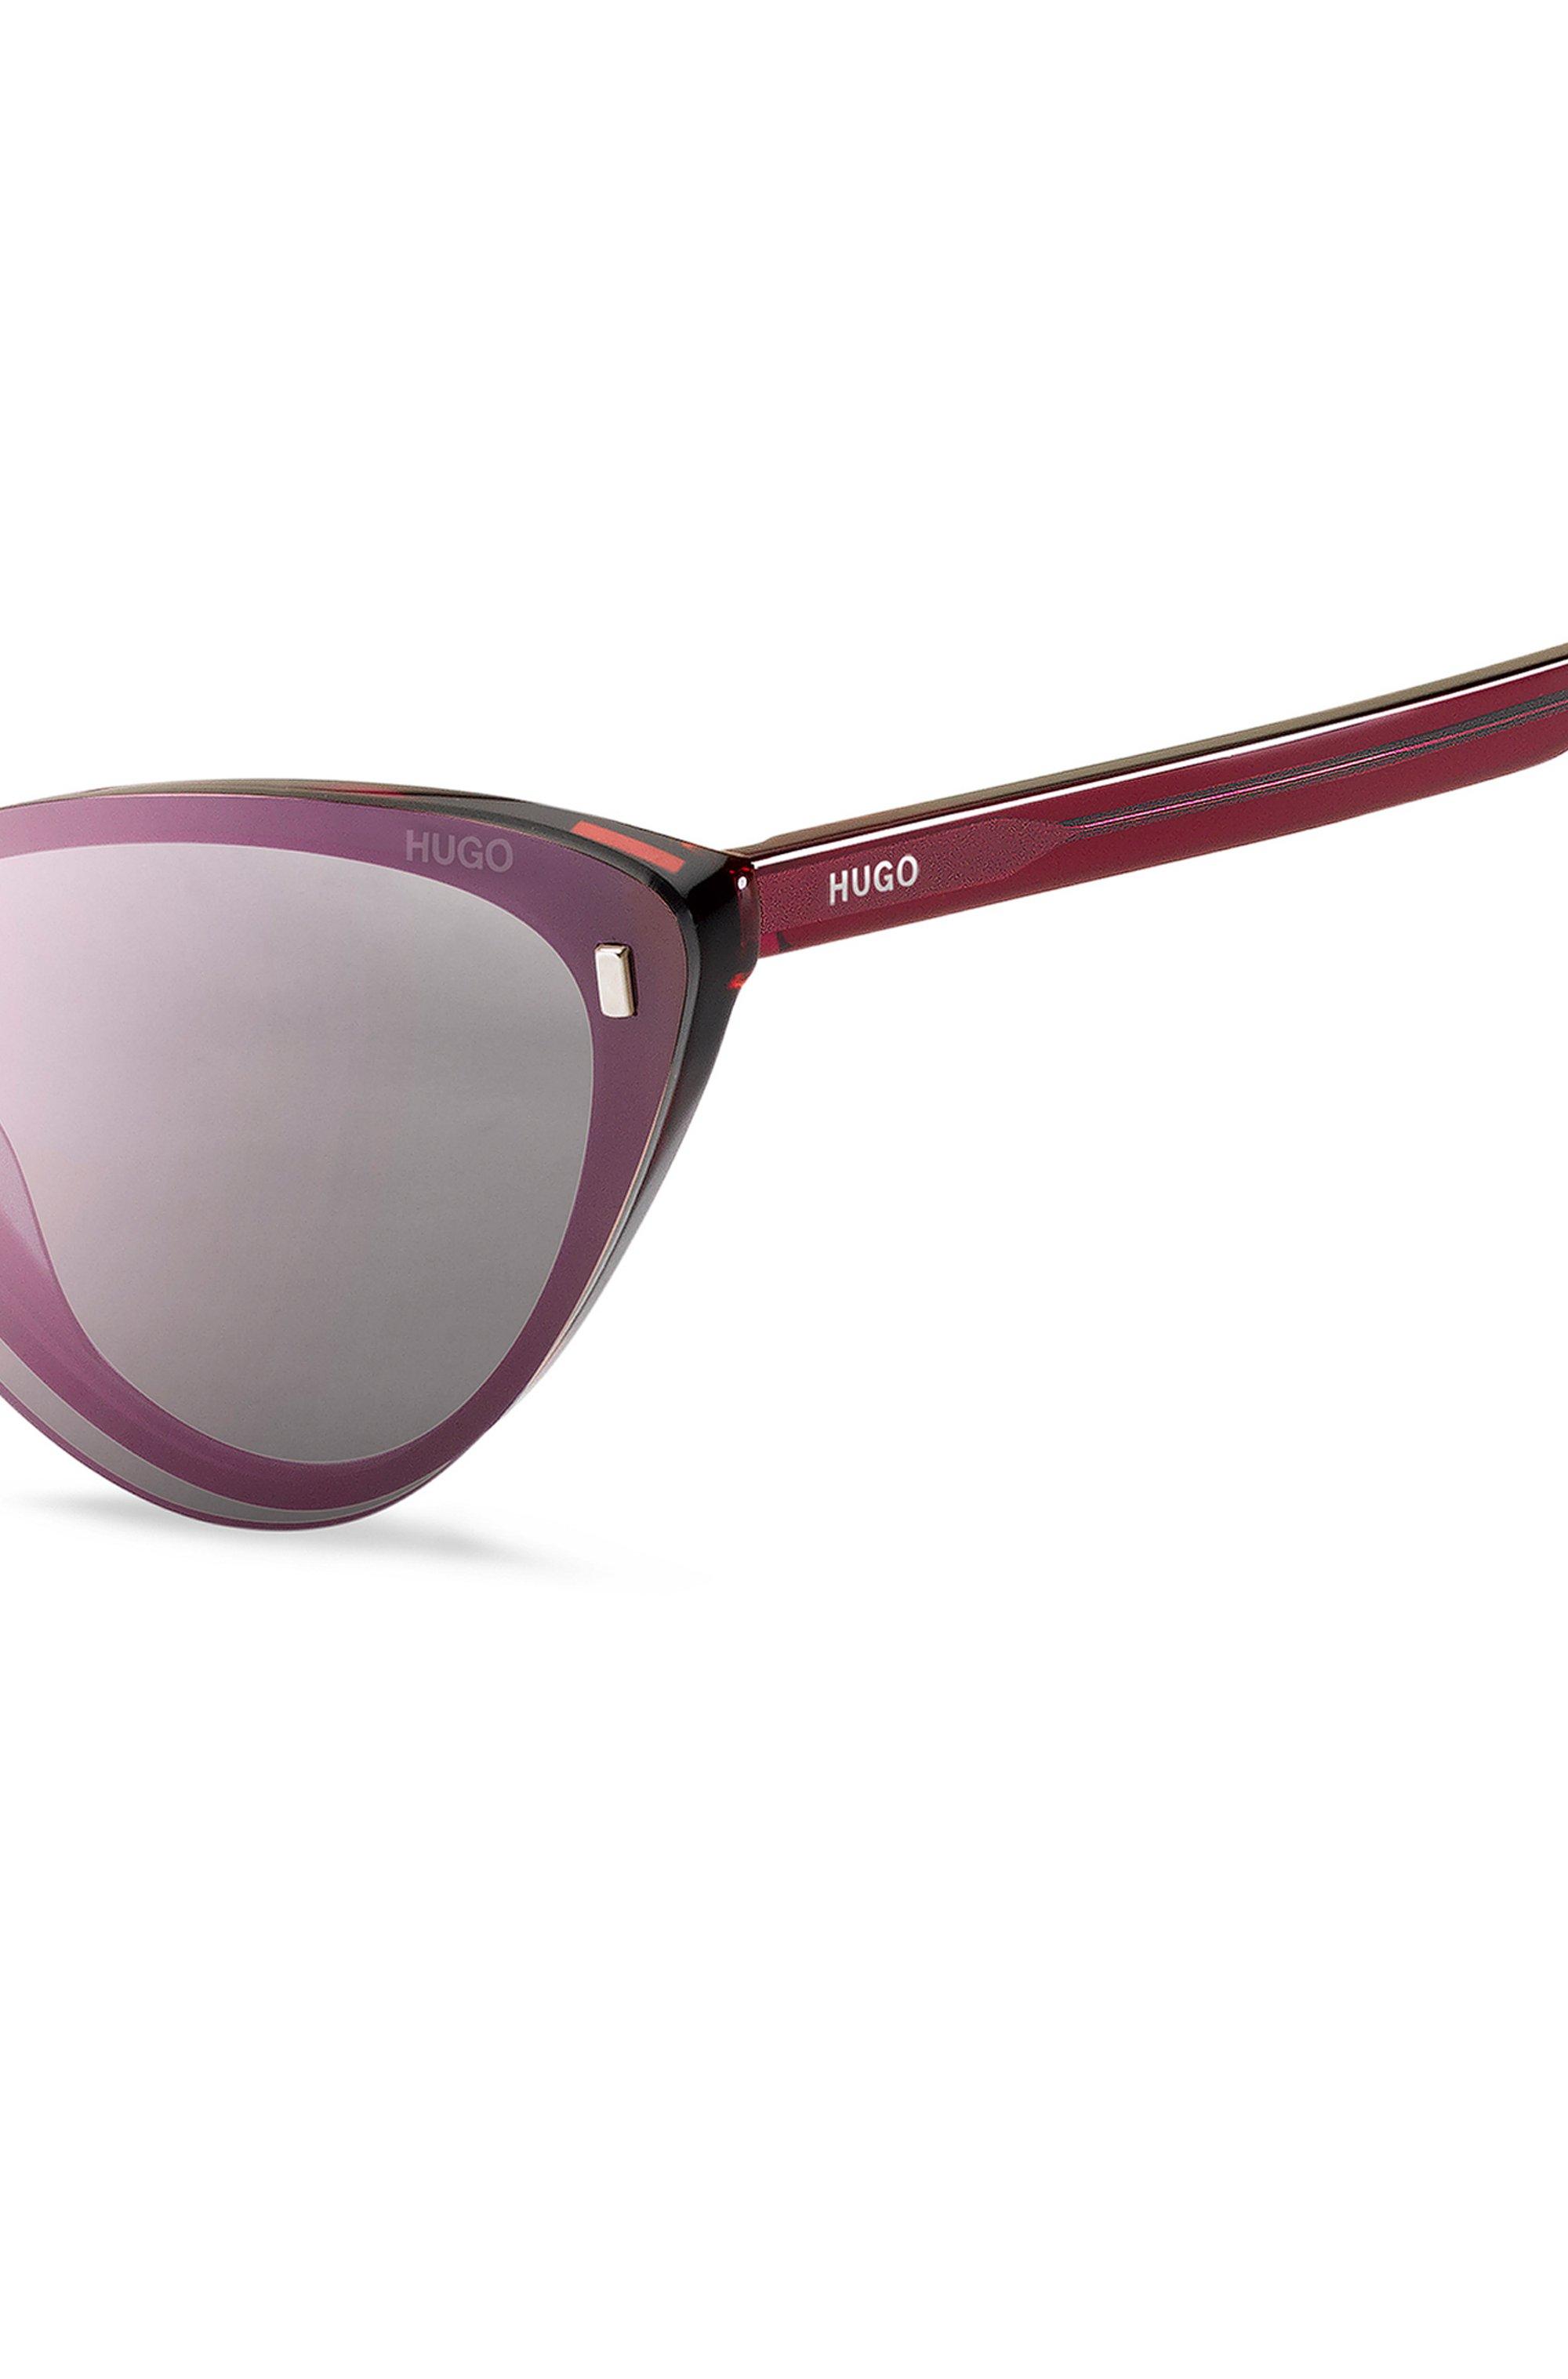 Cherry-Havana optical frames with violet clip-on